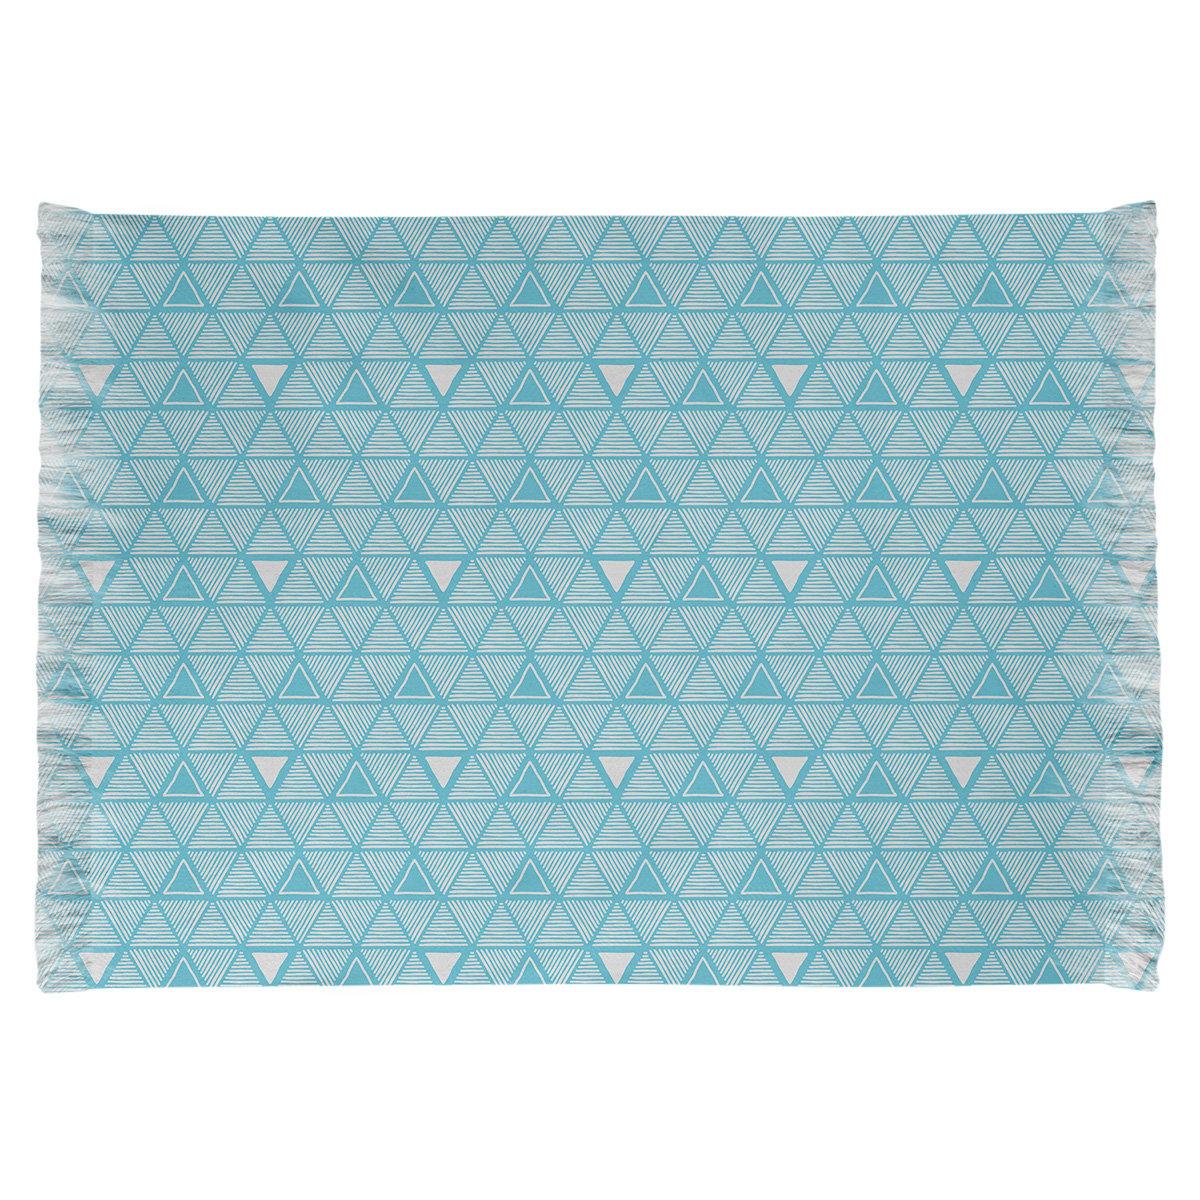 East Urban Home Classic Hand Drawn Triangles Blue Area Rug Wayfair